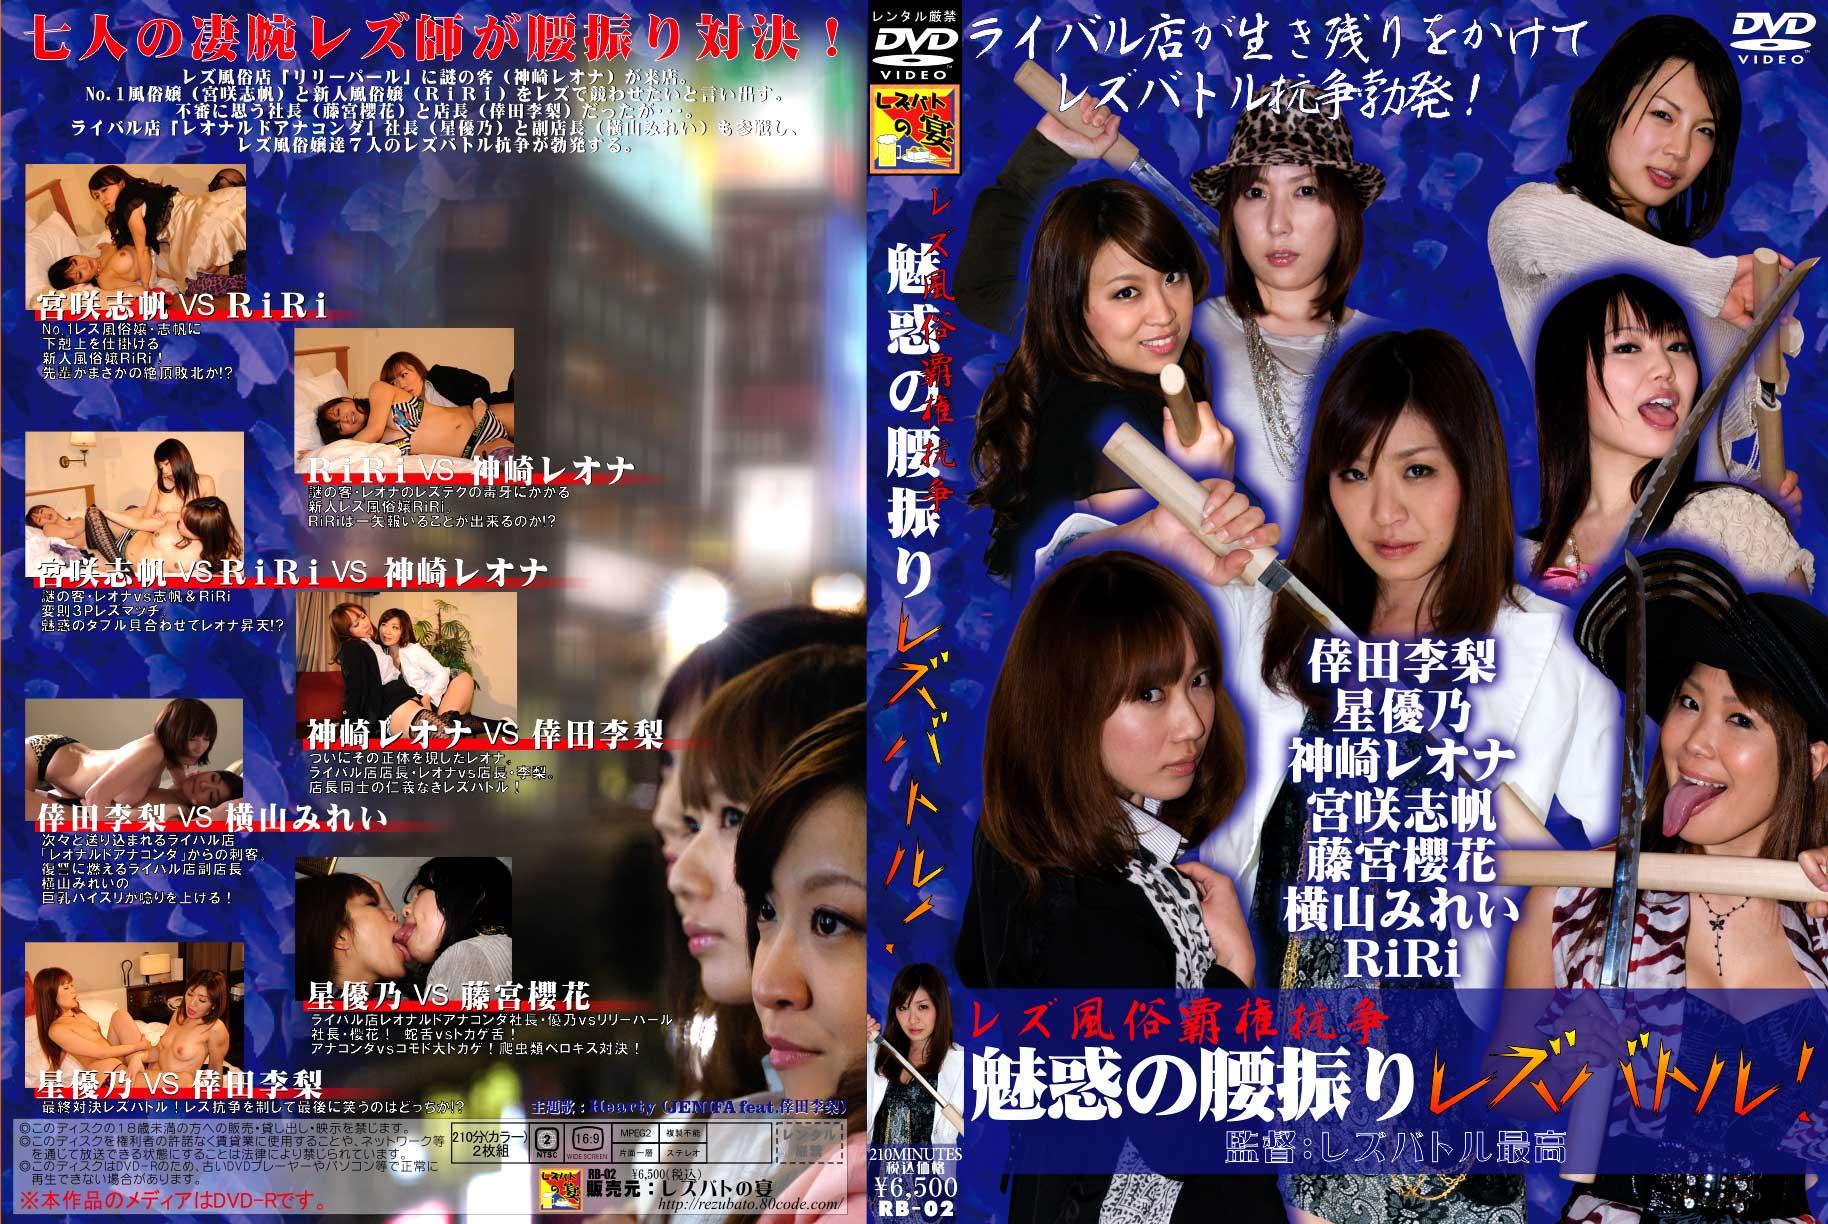 "Lesbian sex hegemony struggle seductive hip swing ""リリーパール"" ""レオナルドアナコンダ"" [Episode 4] now rival Shop Manager, Kanzaki Leona vs lesbian sex shop manager-Riri koda"